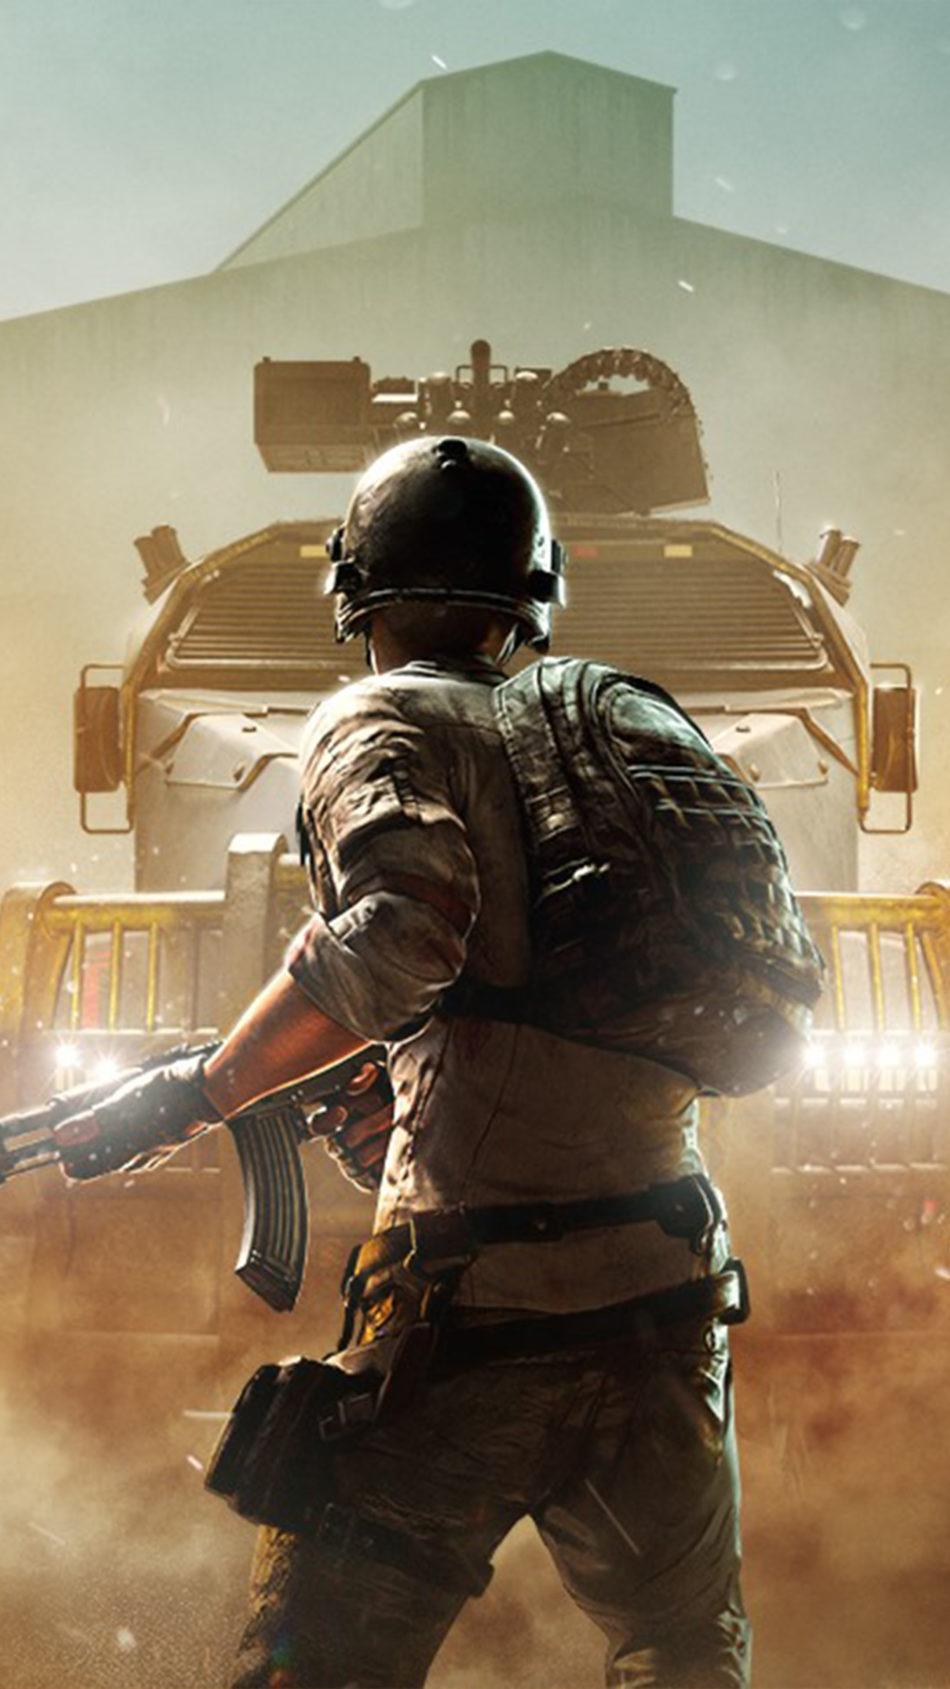 Playerunknown's Battlegrounds Season 10 Poster 2020 4K Ultra HD Mobile Wallpaper